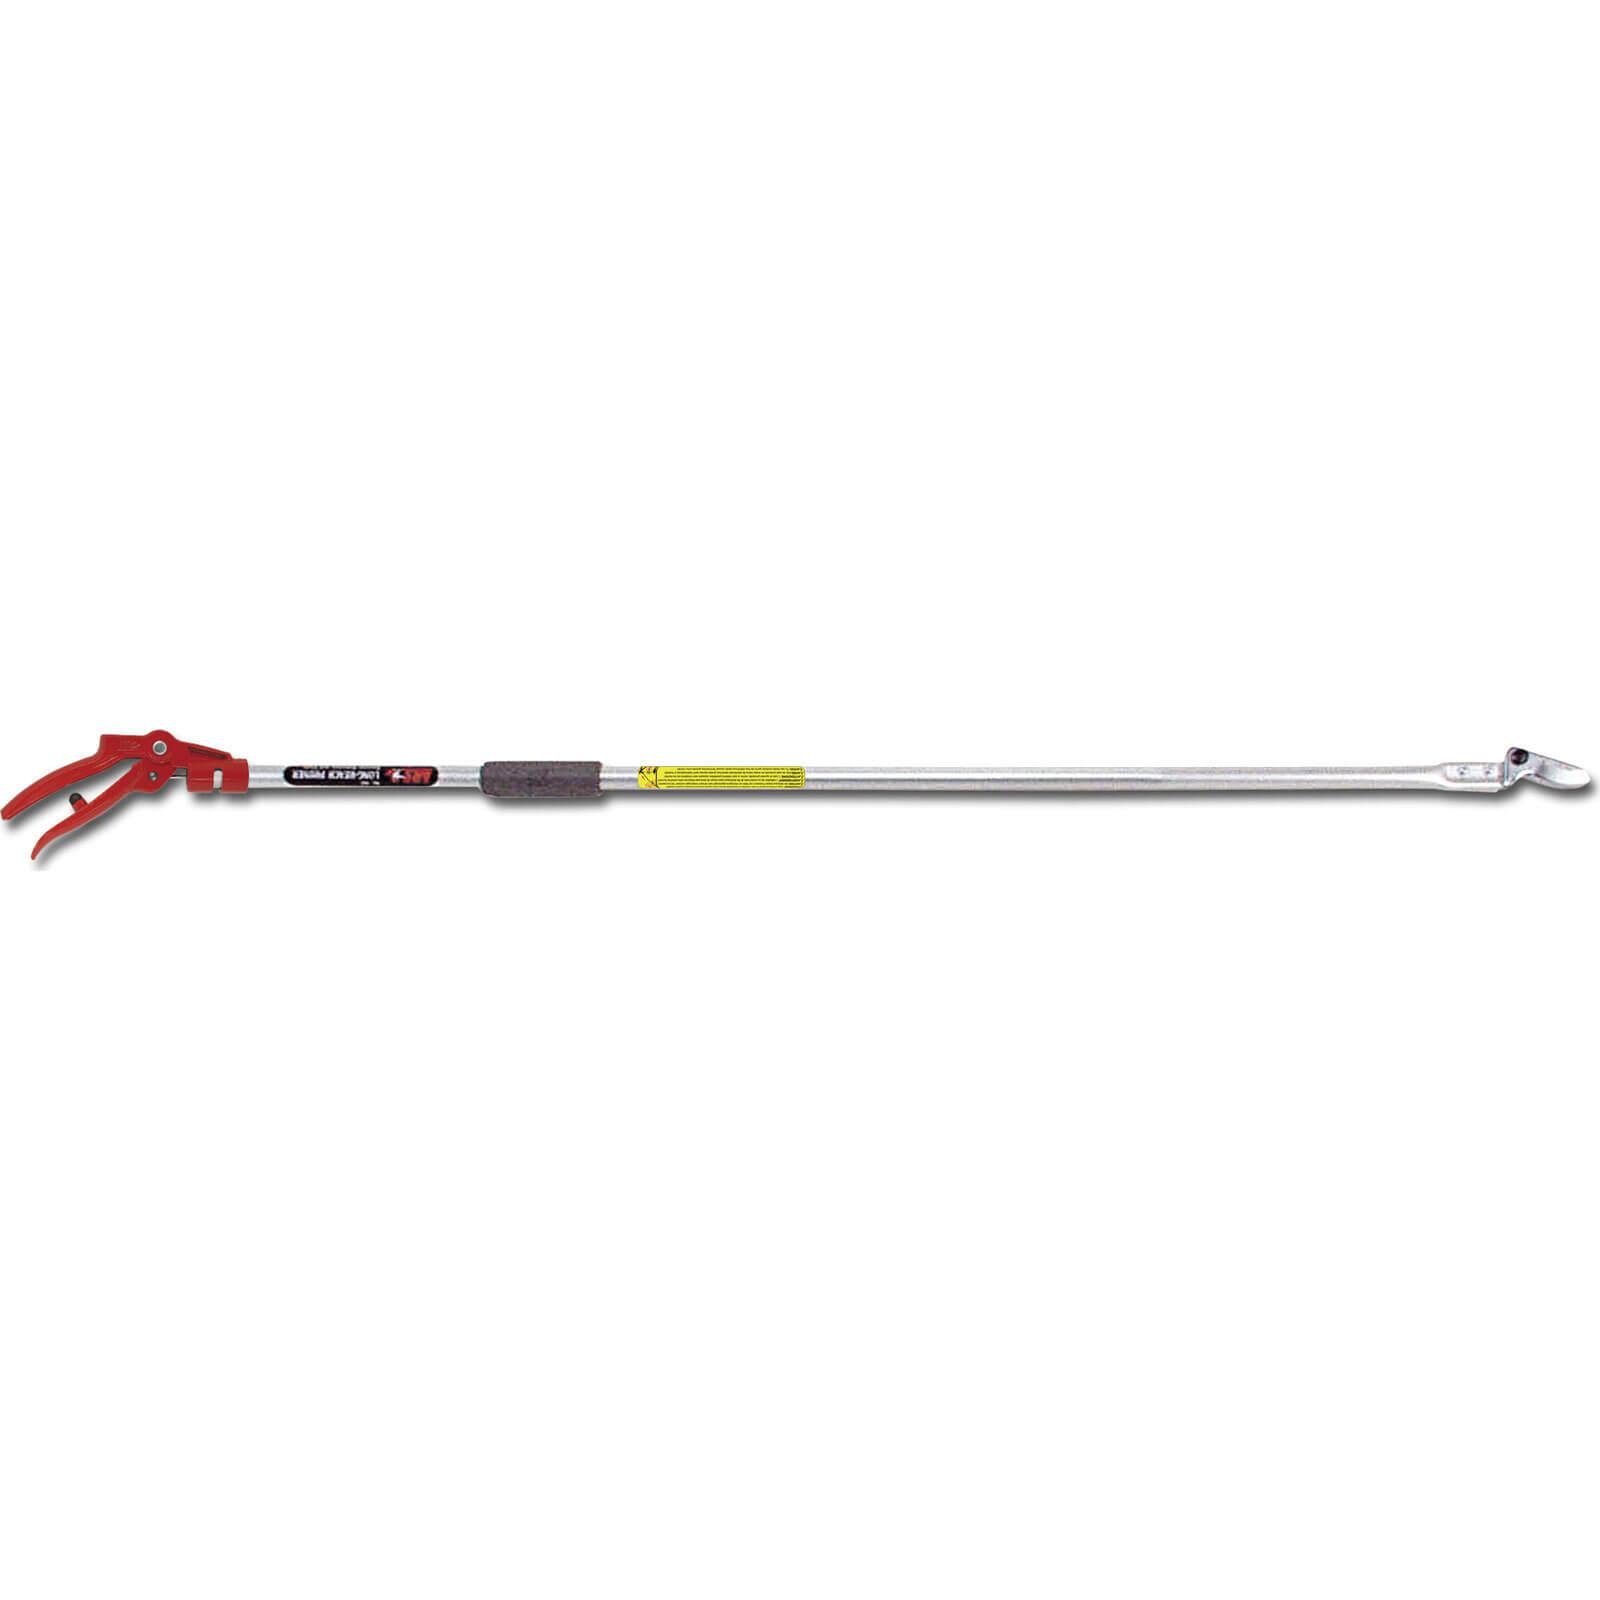 ARS 160-1.2 Long Reach Cut & Hold Pruner 1.2m Long